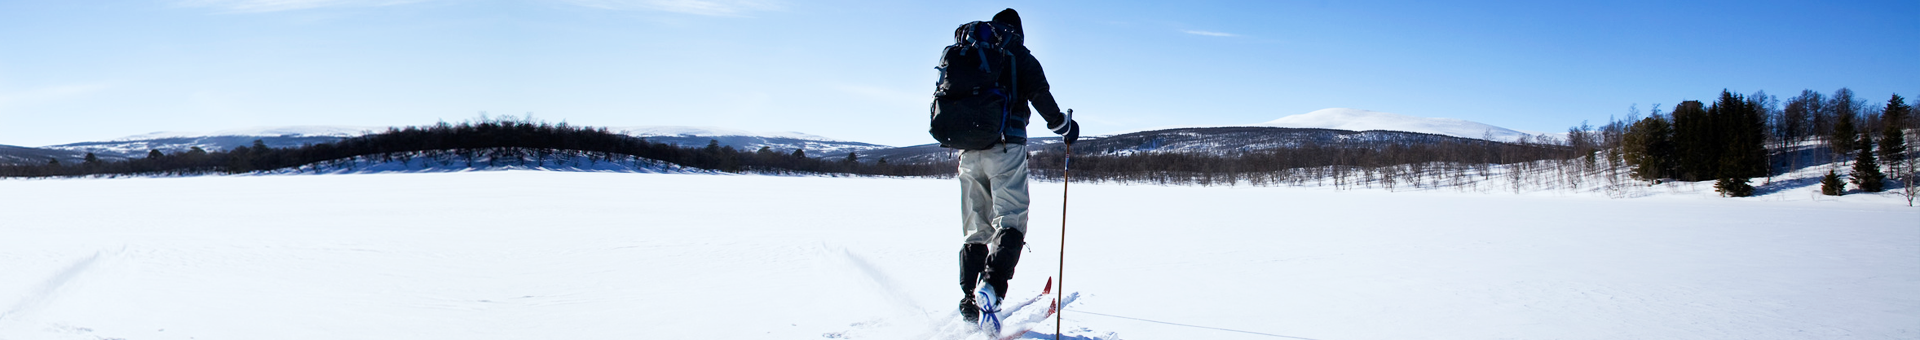 Esquís de Travesía Nórdica